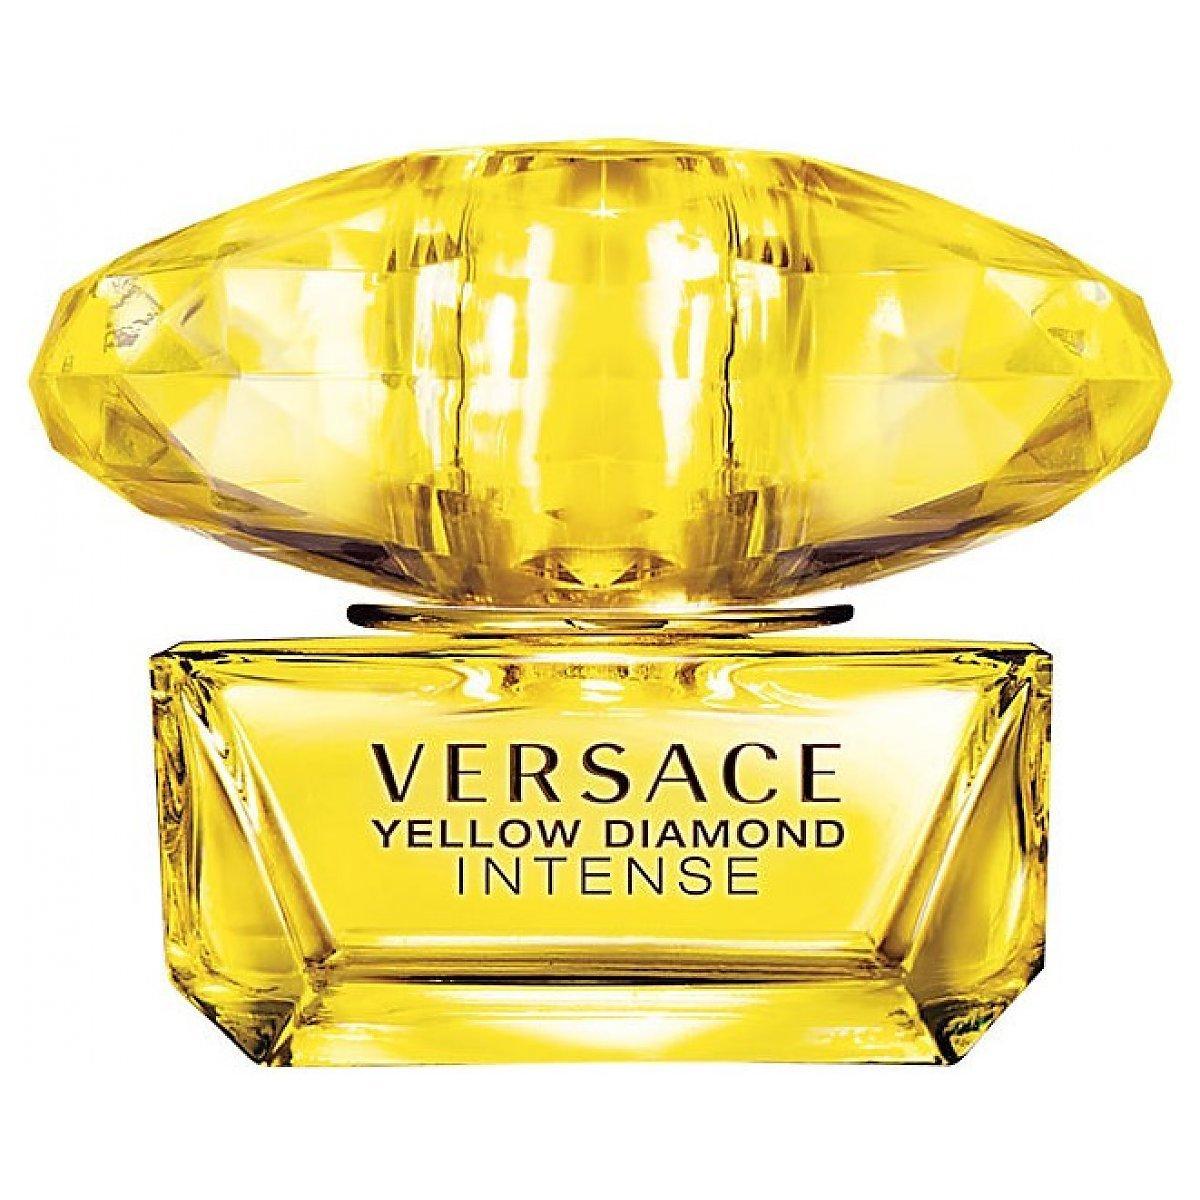 versace yellow diamond intense woda perfumowana spray 90ml. Black Bedroom Furniture Sets. Home Design Ideas